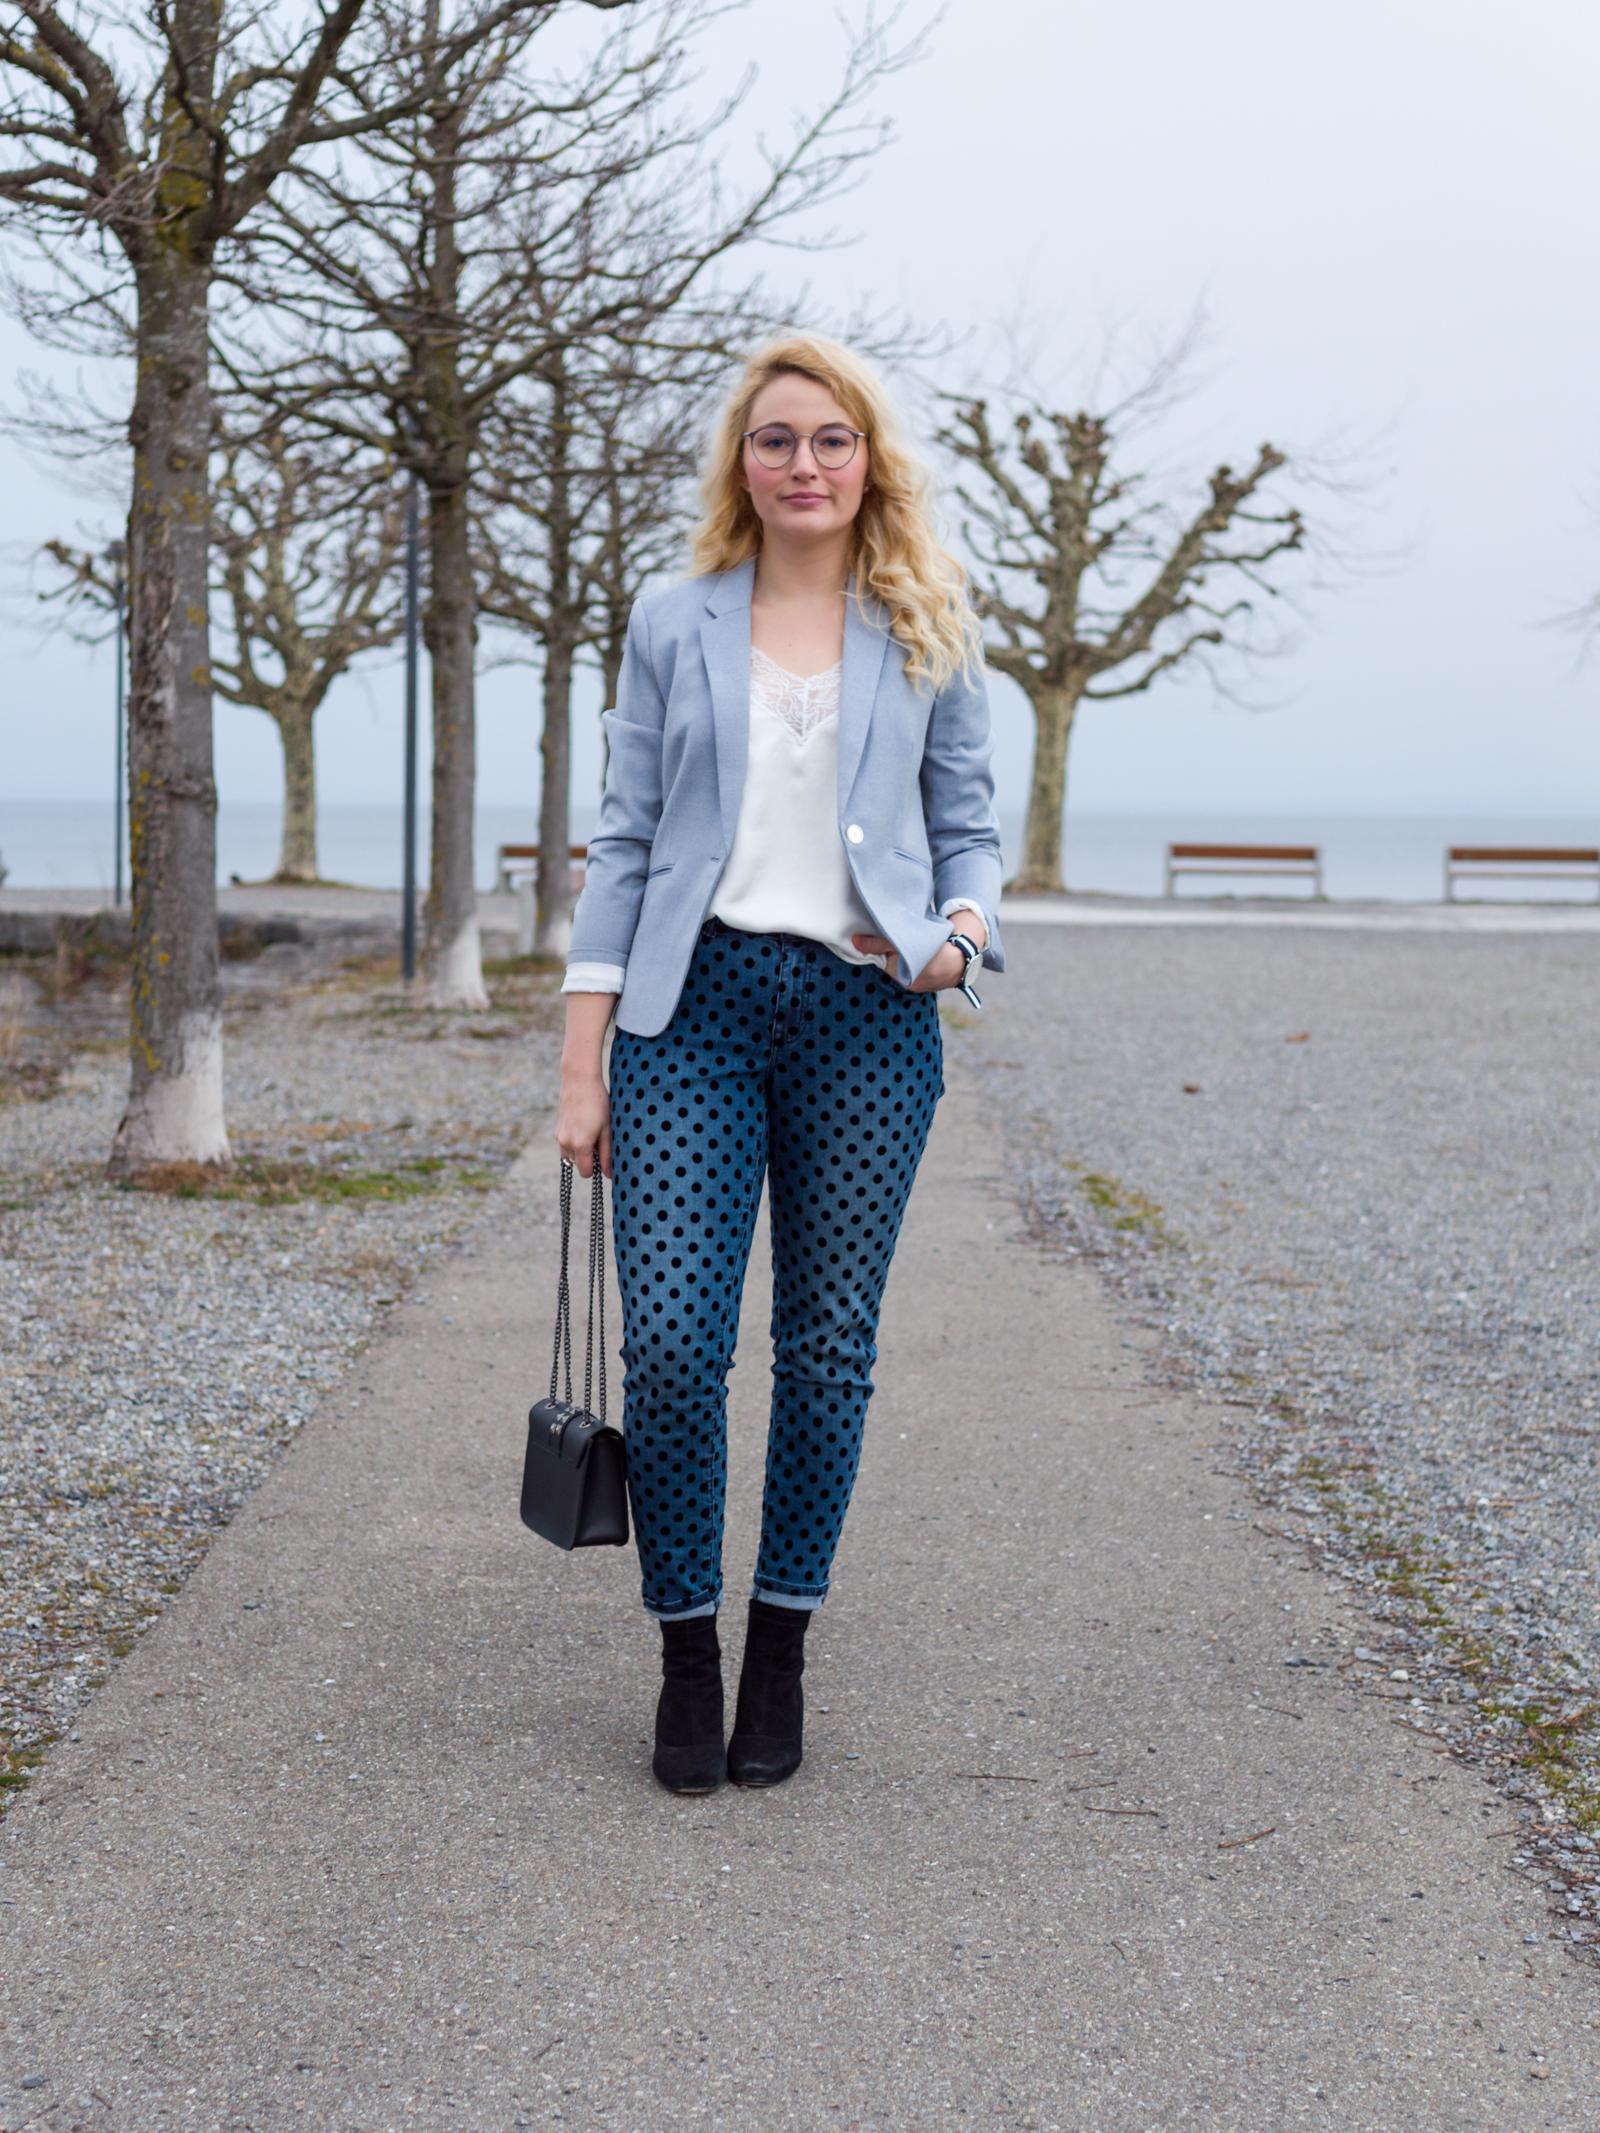 Swiss Fashionblog